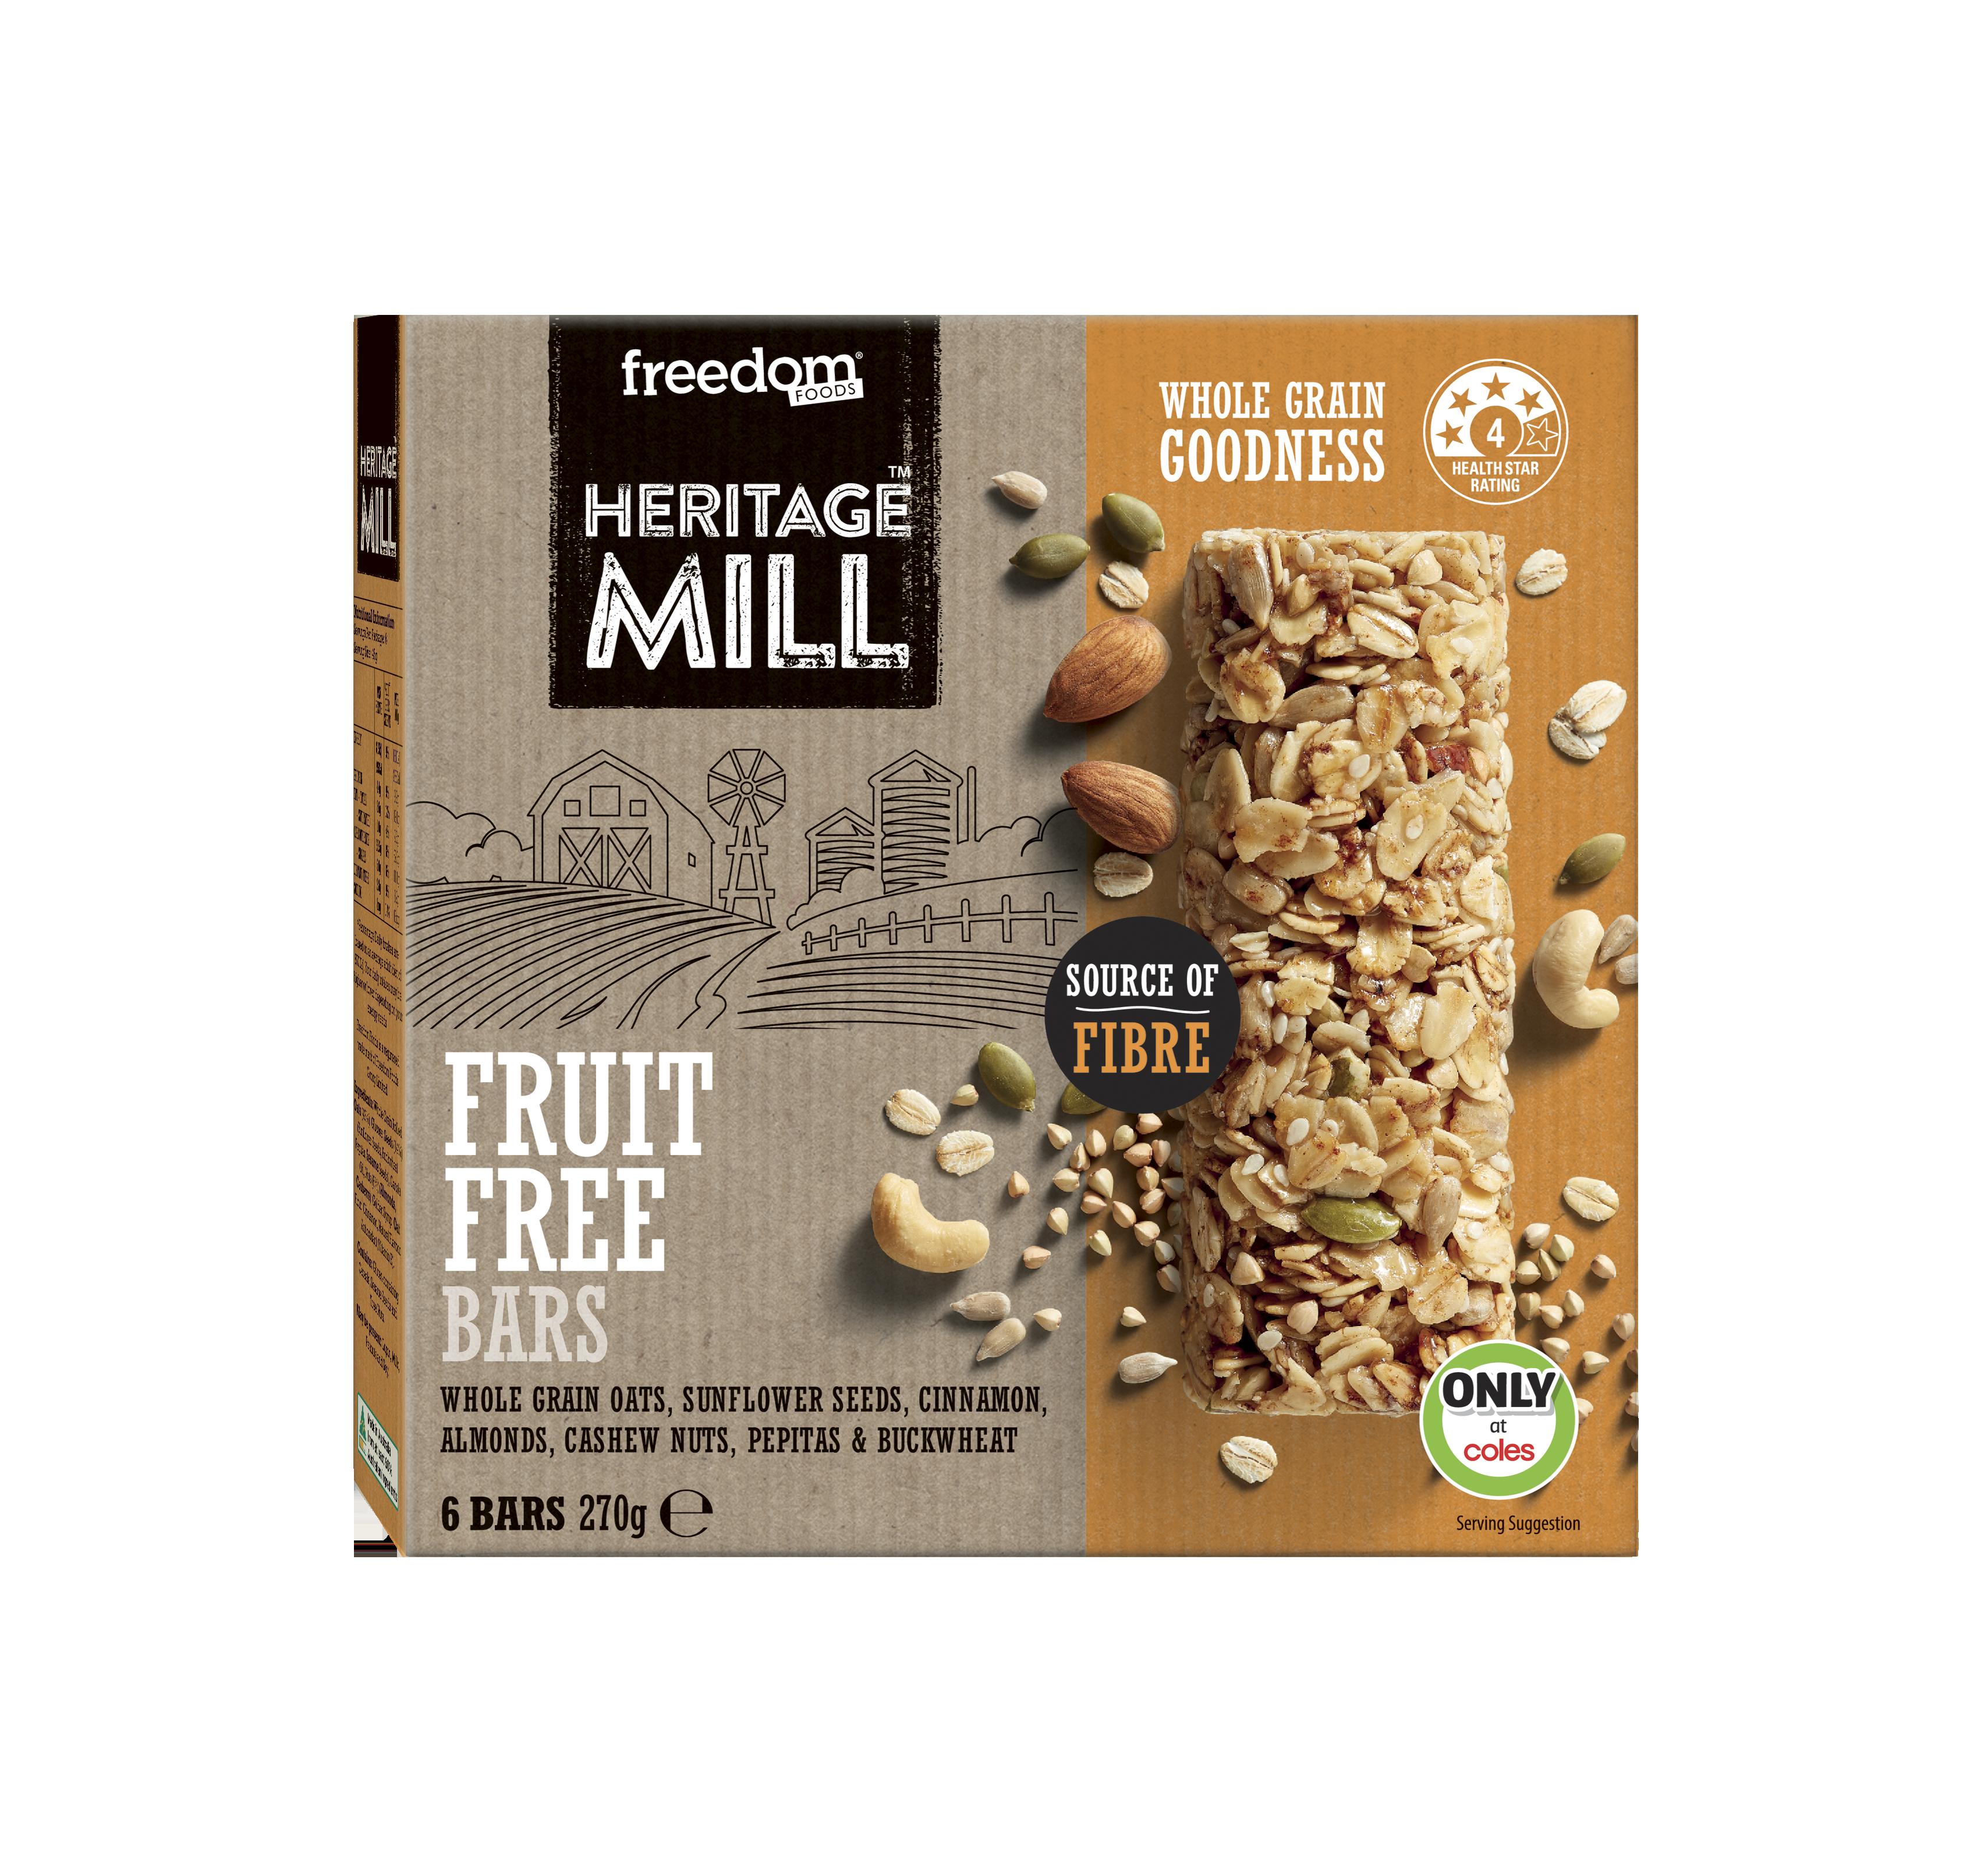 Heritage Mill Fruit Free Bars